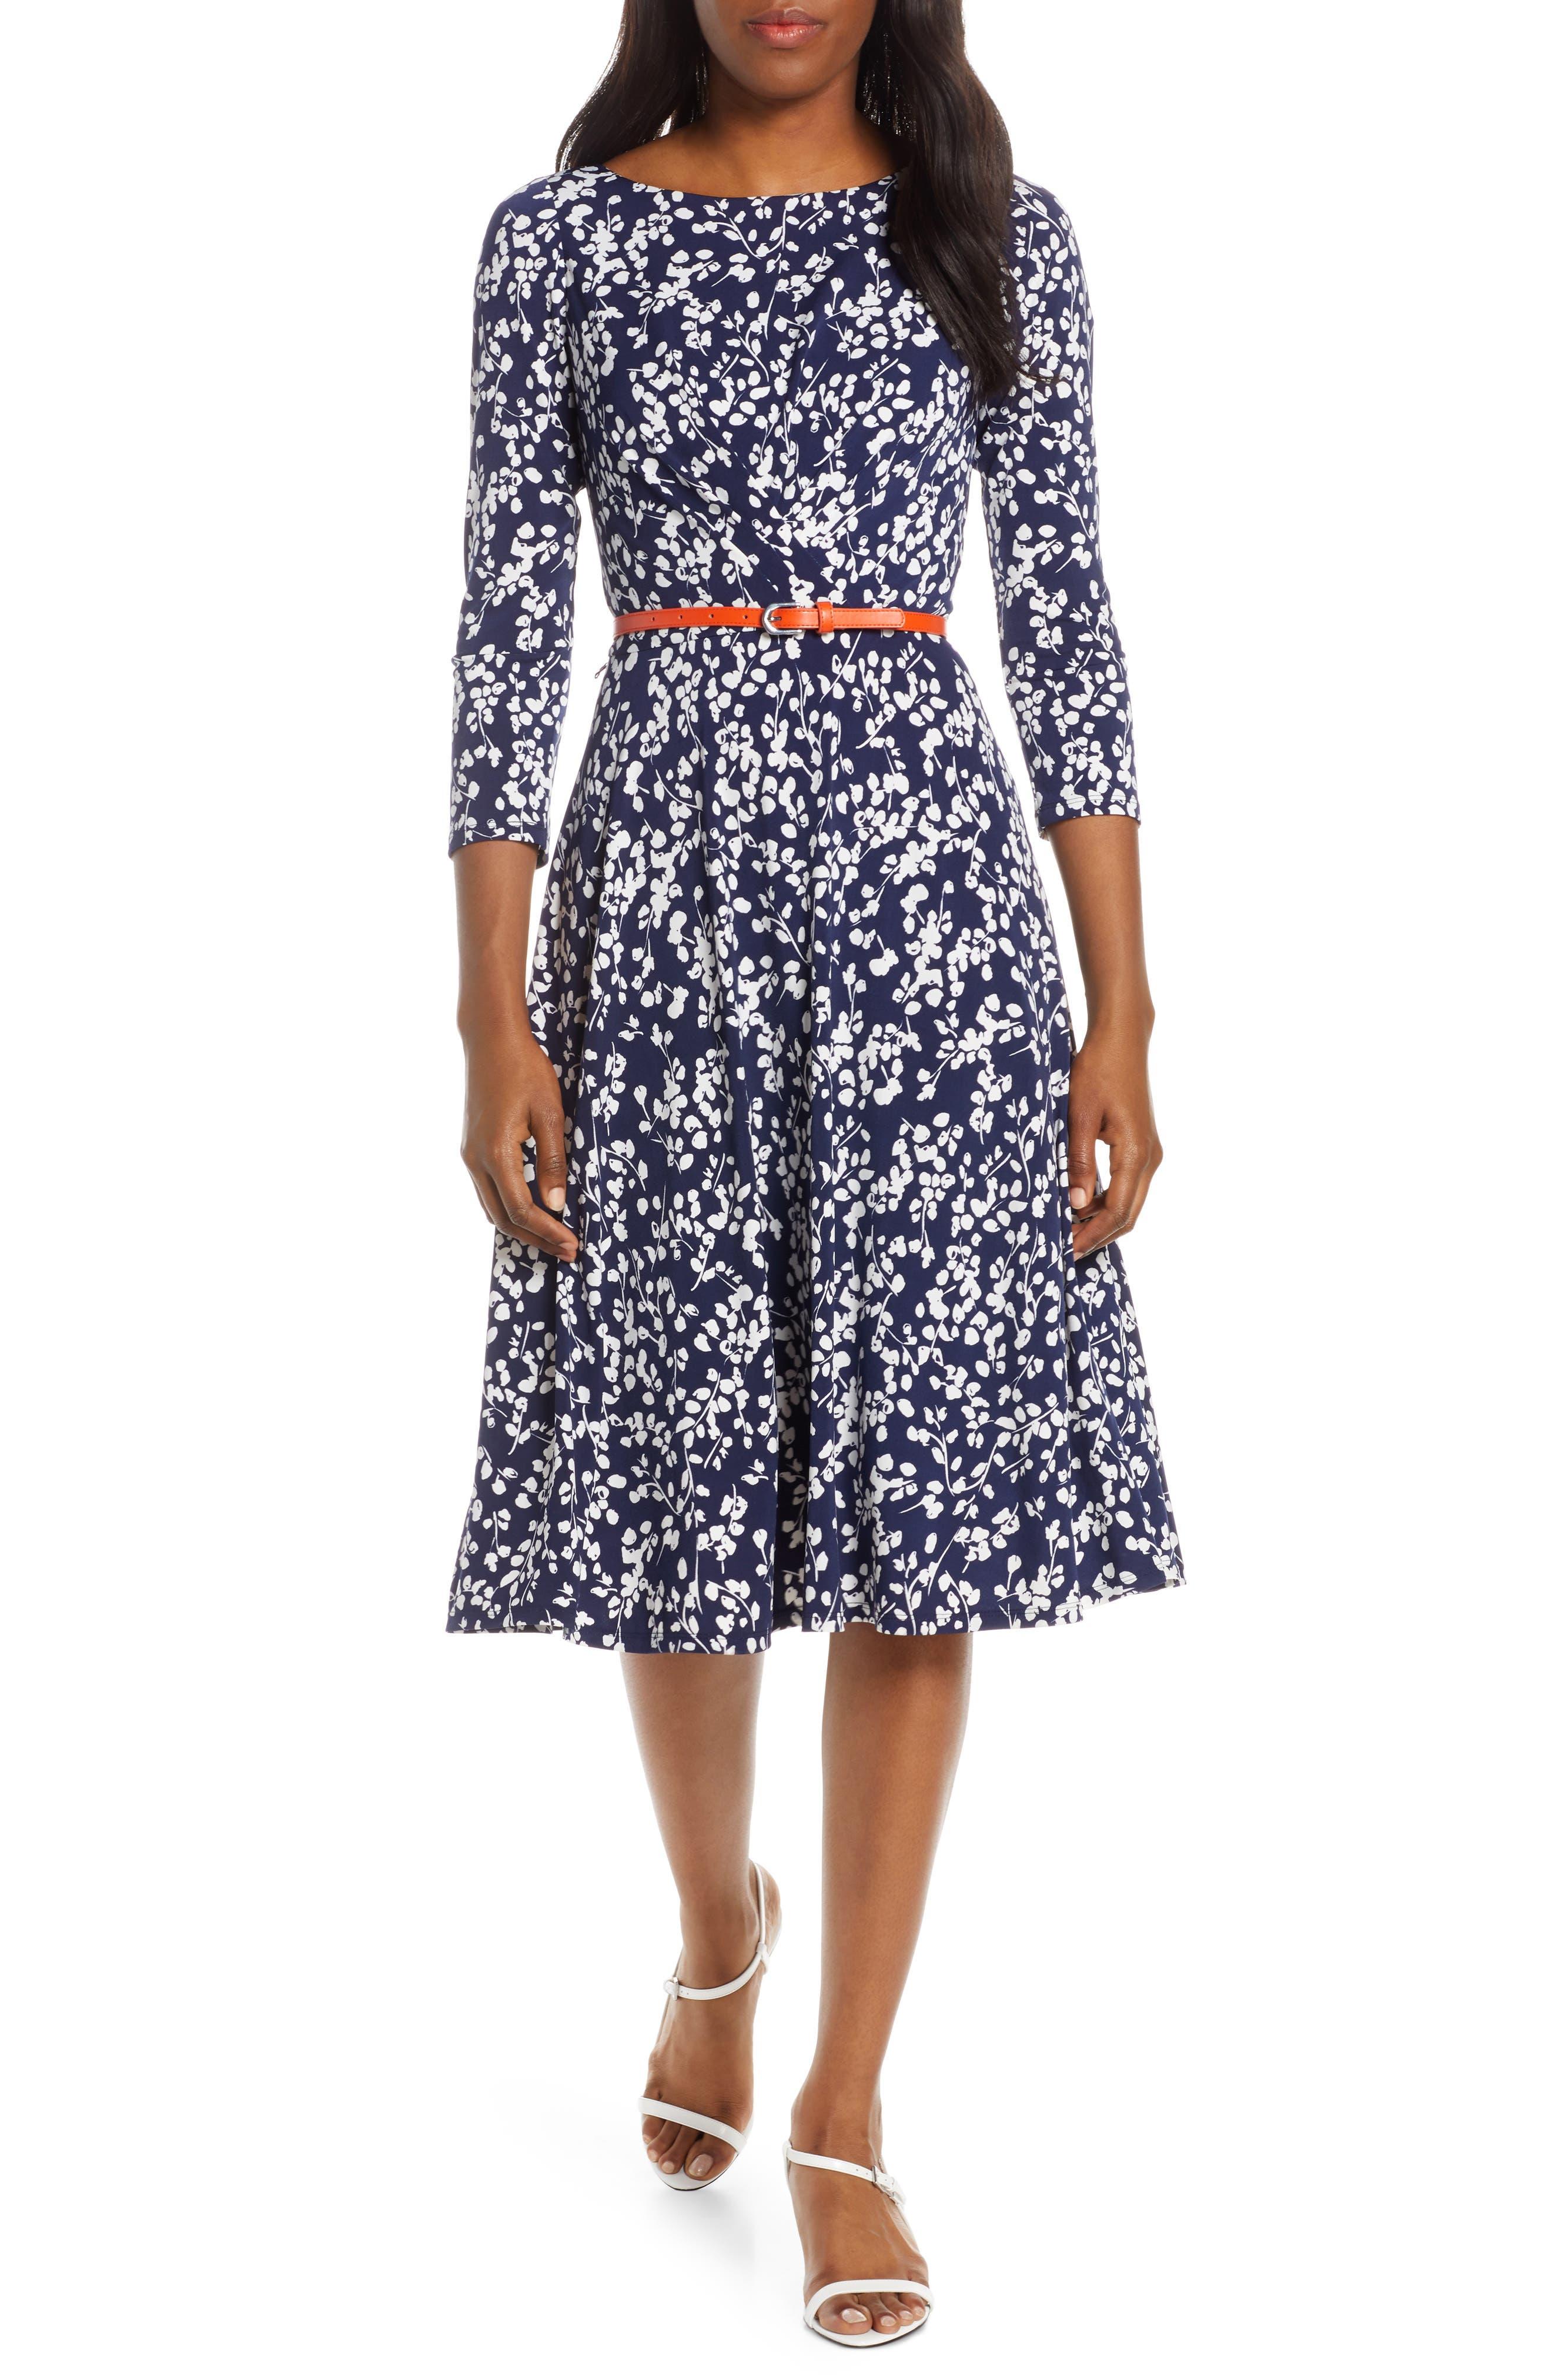 Petite Harper Rose Floral Print Belted Midi Dress, Blue